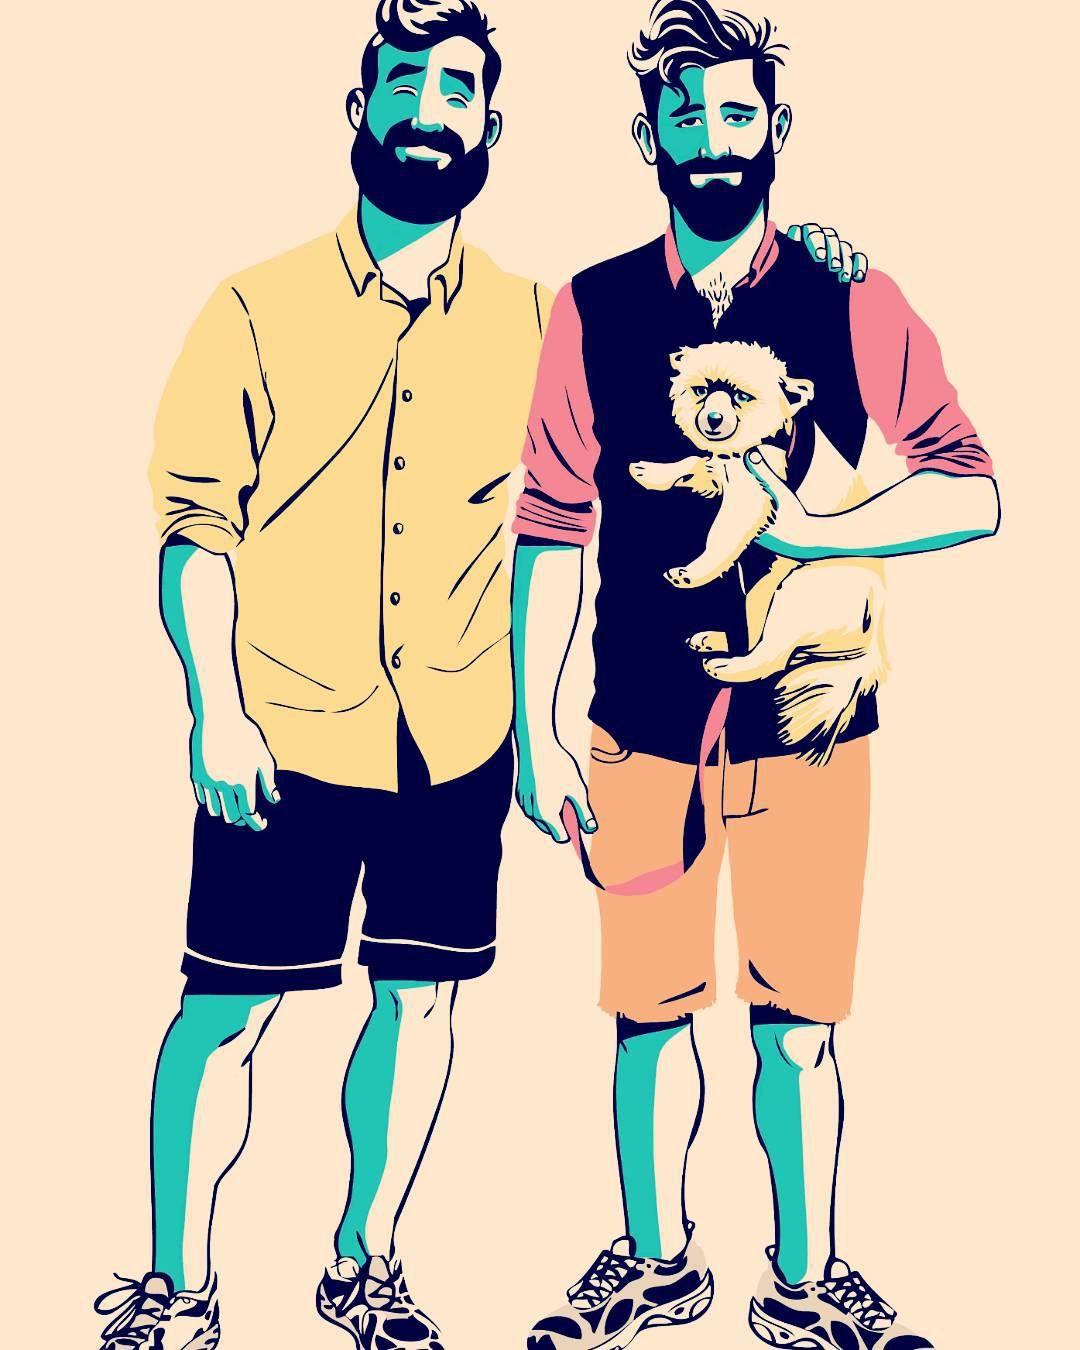 #gaycoupleart #gay #gaycouple #beards #diegofelizart #loveislove #queerart #queer #gaymen #gayillustration #gayromance #samelove #onelove by diegofelizart